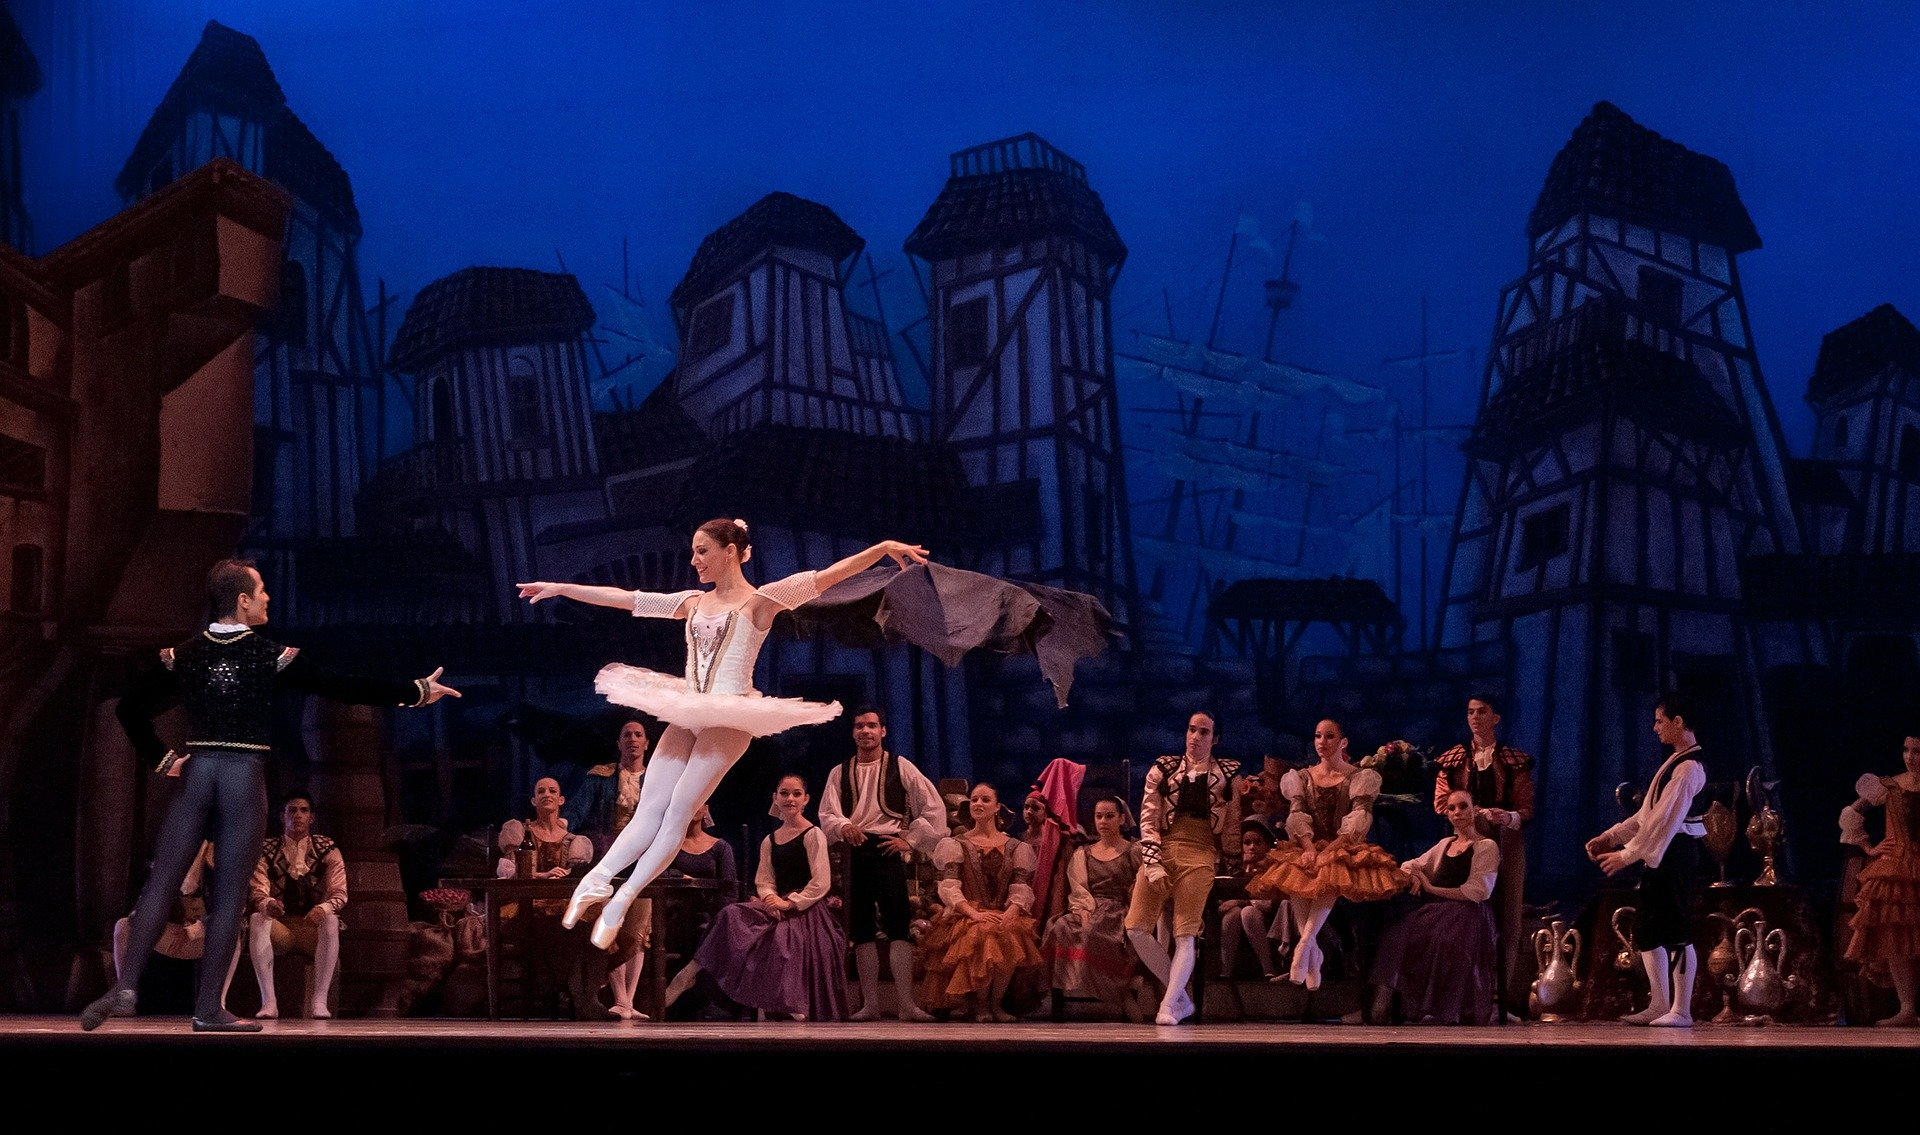 Ballet at opera house